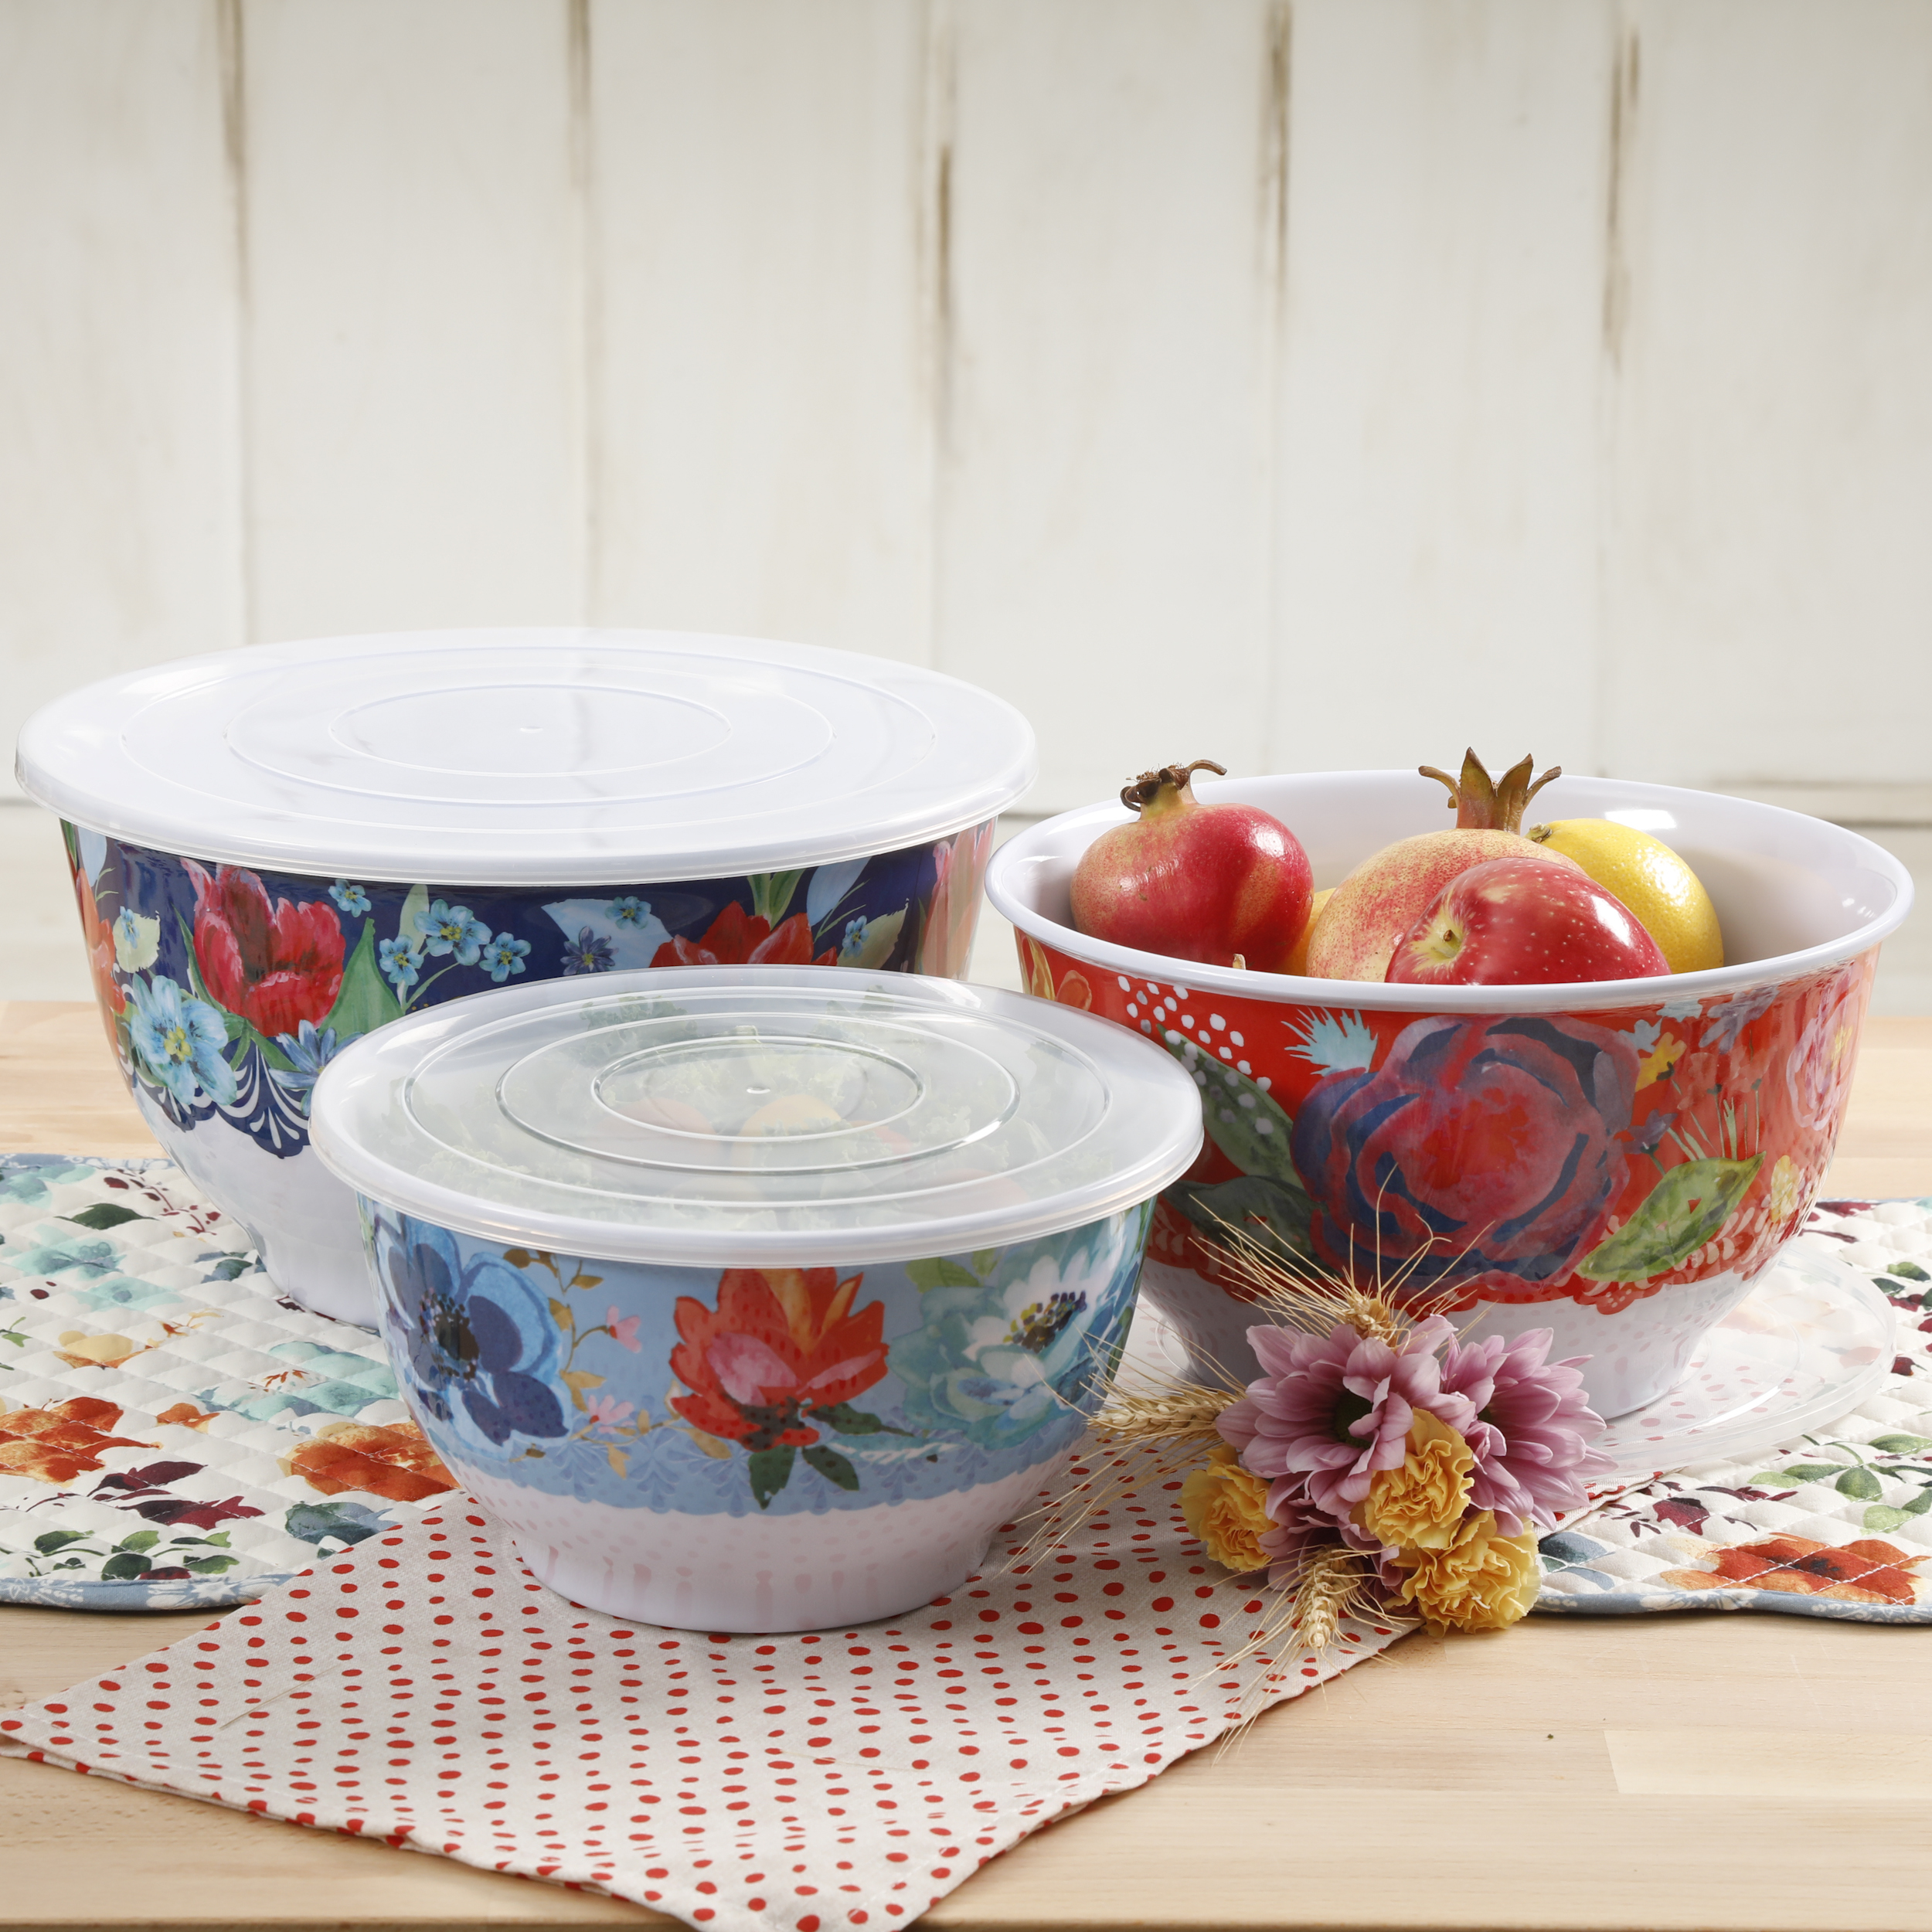 The Pioneer Woman Spring Bouquet 3-Piece Melamine Serving Bowl Set